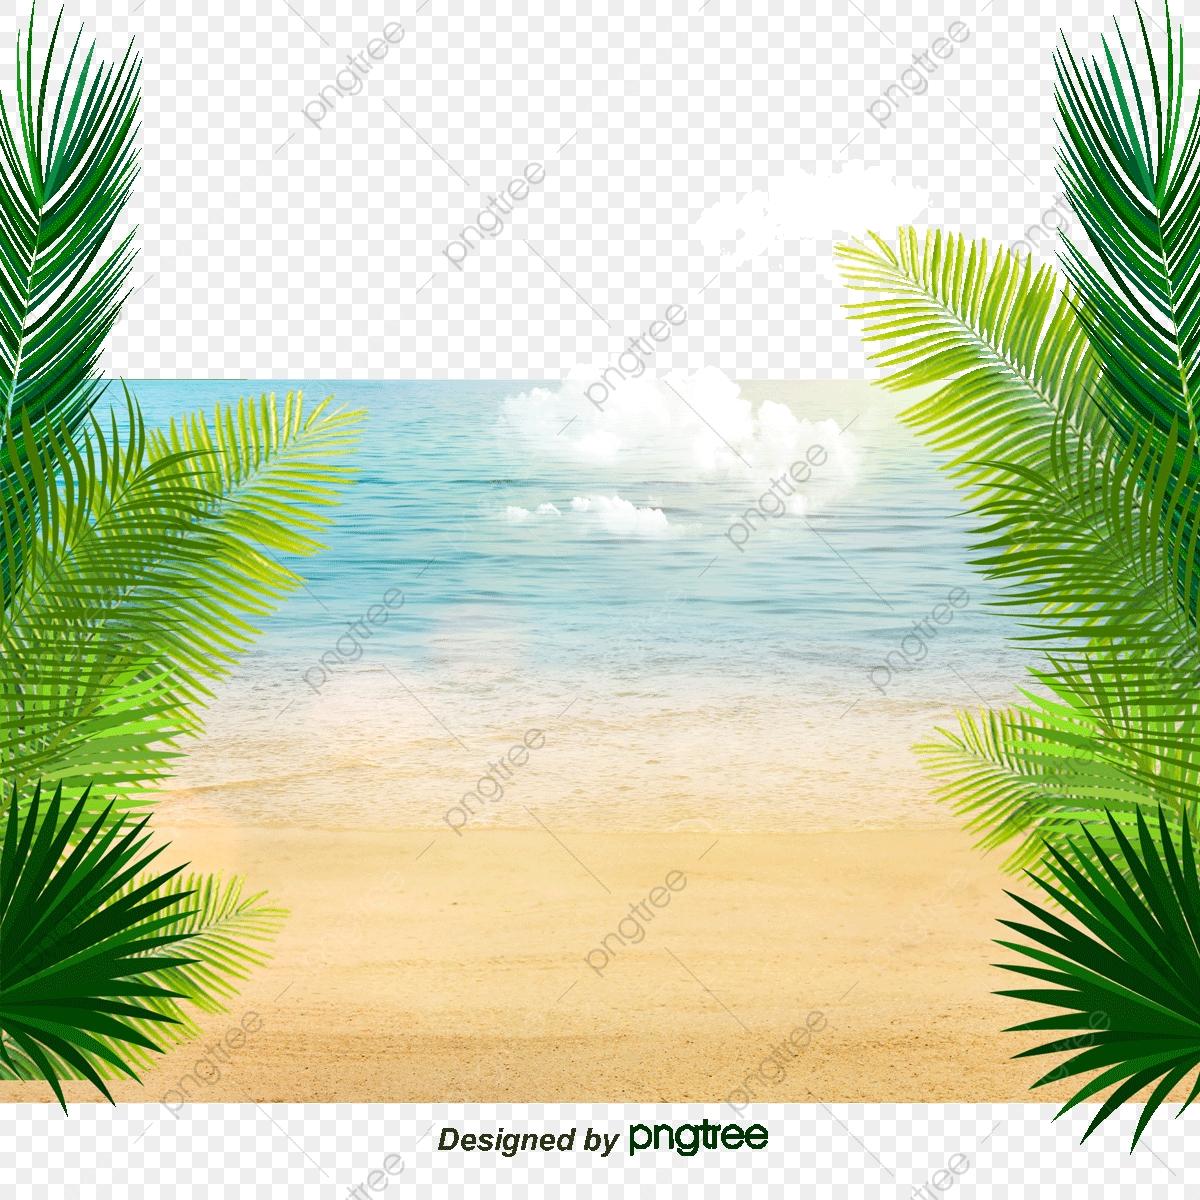 Great Beach Coconut Tree Decorative Background, Coconut Clipart.